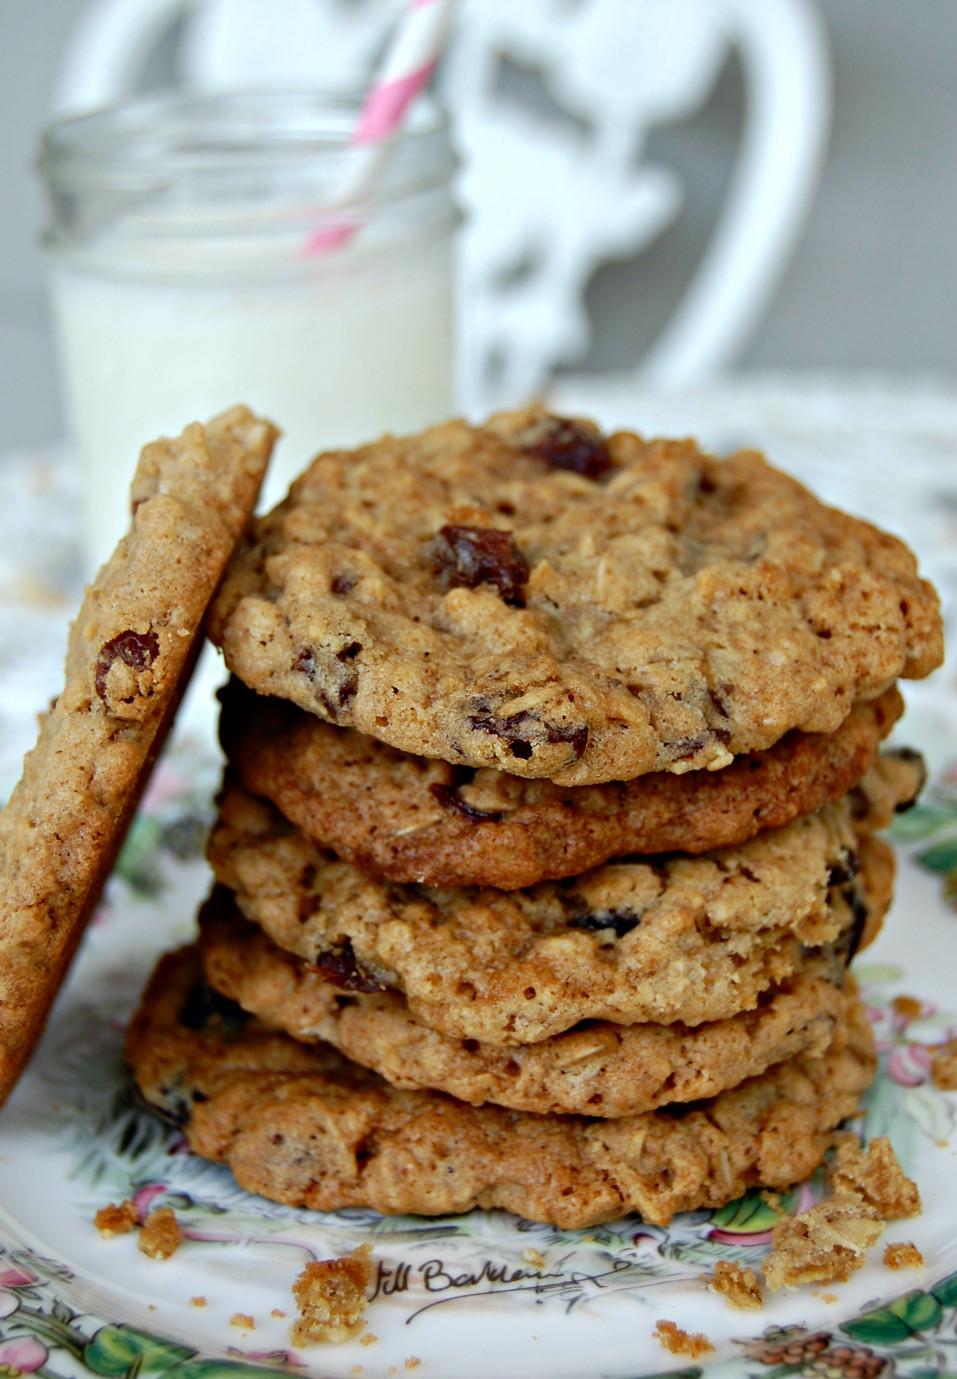 Oatmeal Raisin Cookies  Goal Break Chewy Oatmeal Raisin Cookies